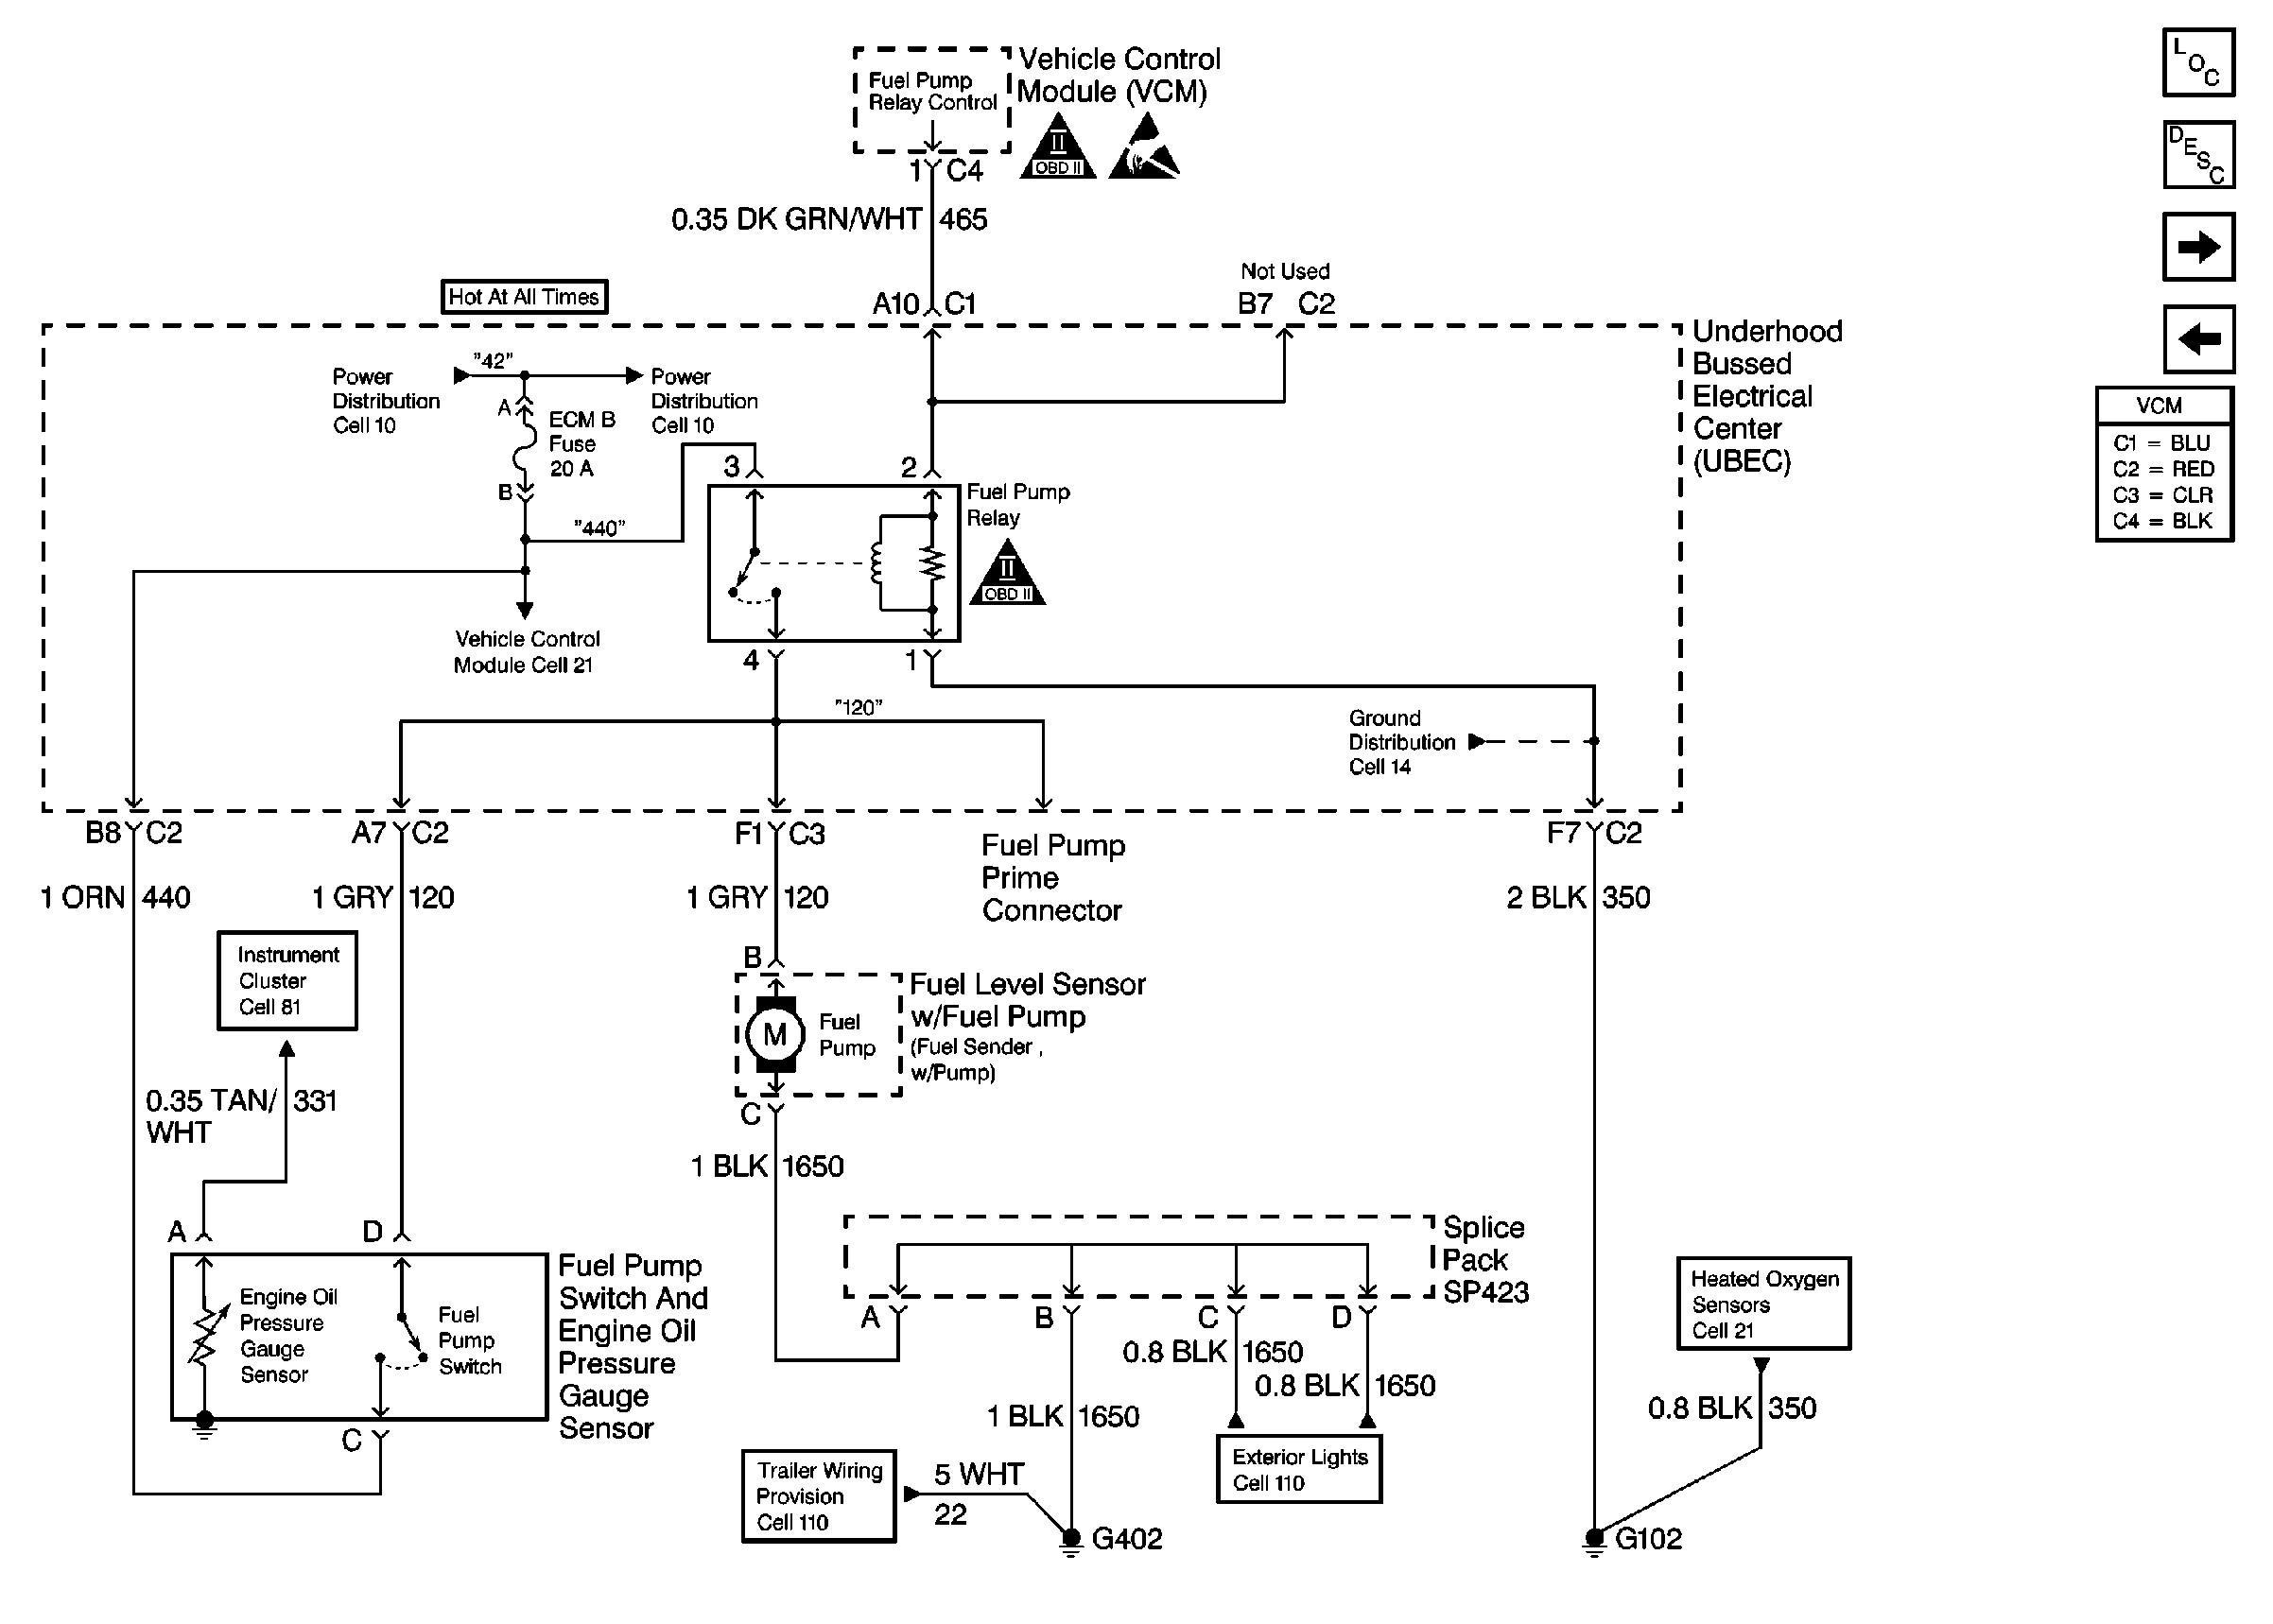 11 pin ice cube relay wiring diagram wiring diagramlatching 8 pin relay wiring diagram wiring diagram kni 11 pin ice cube